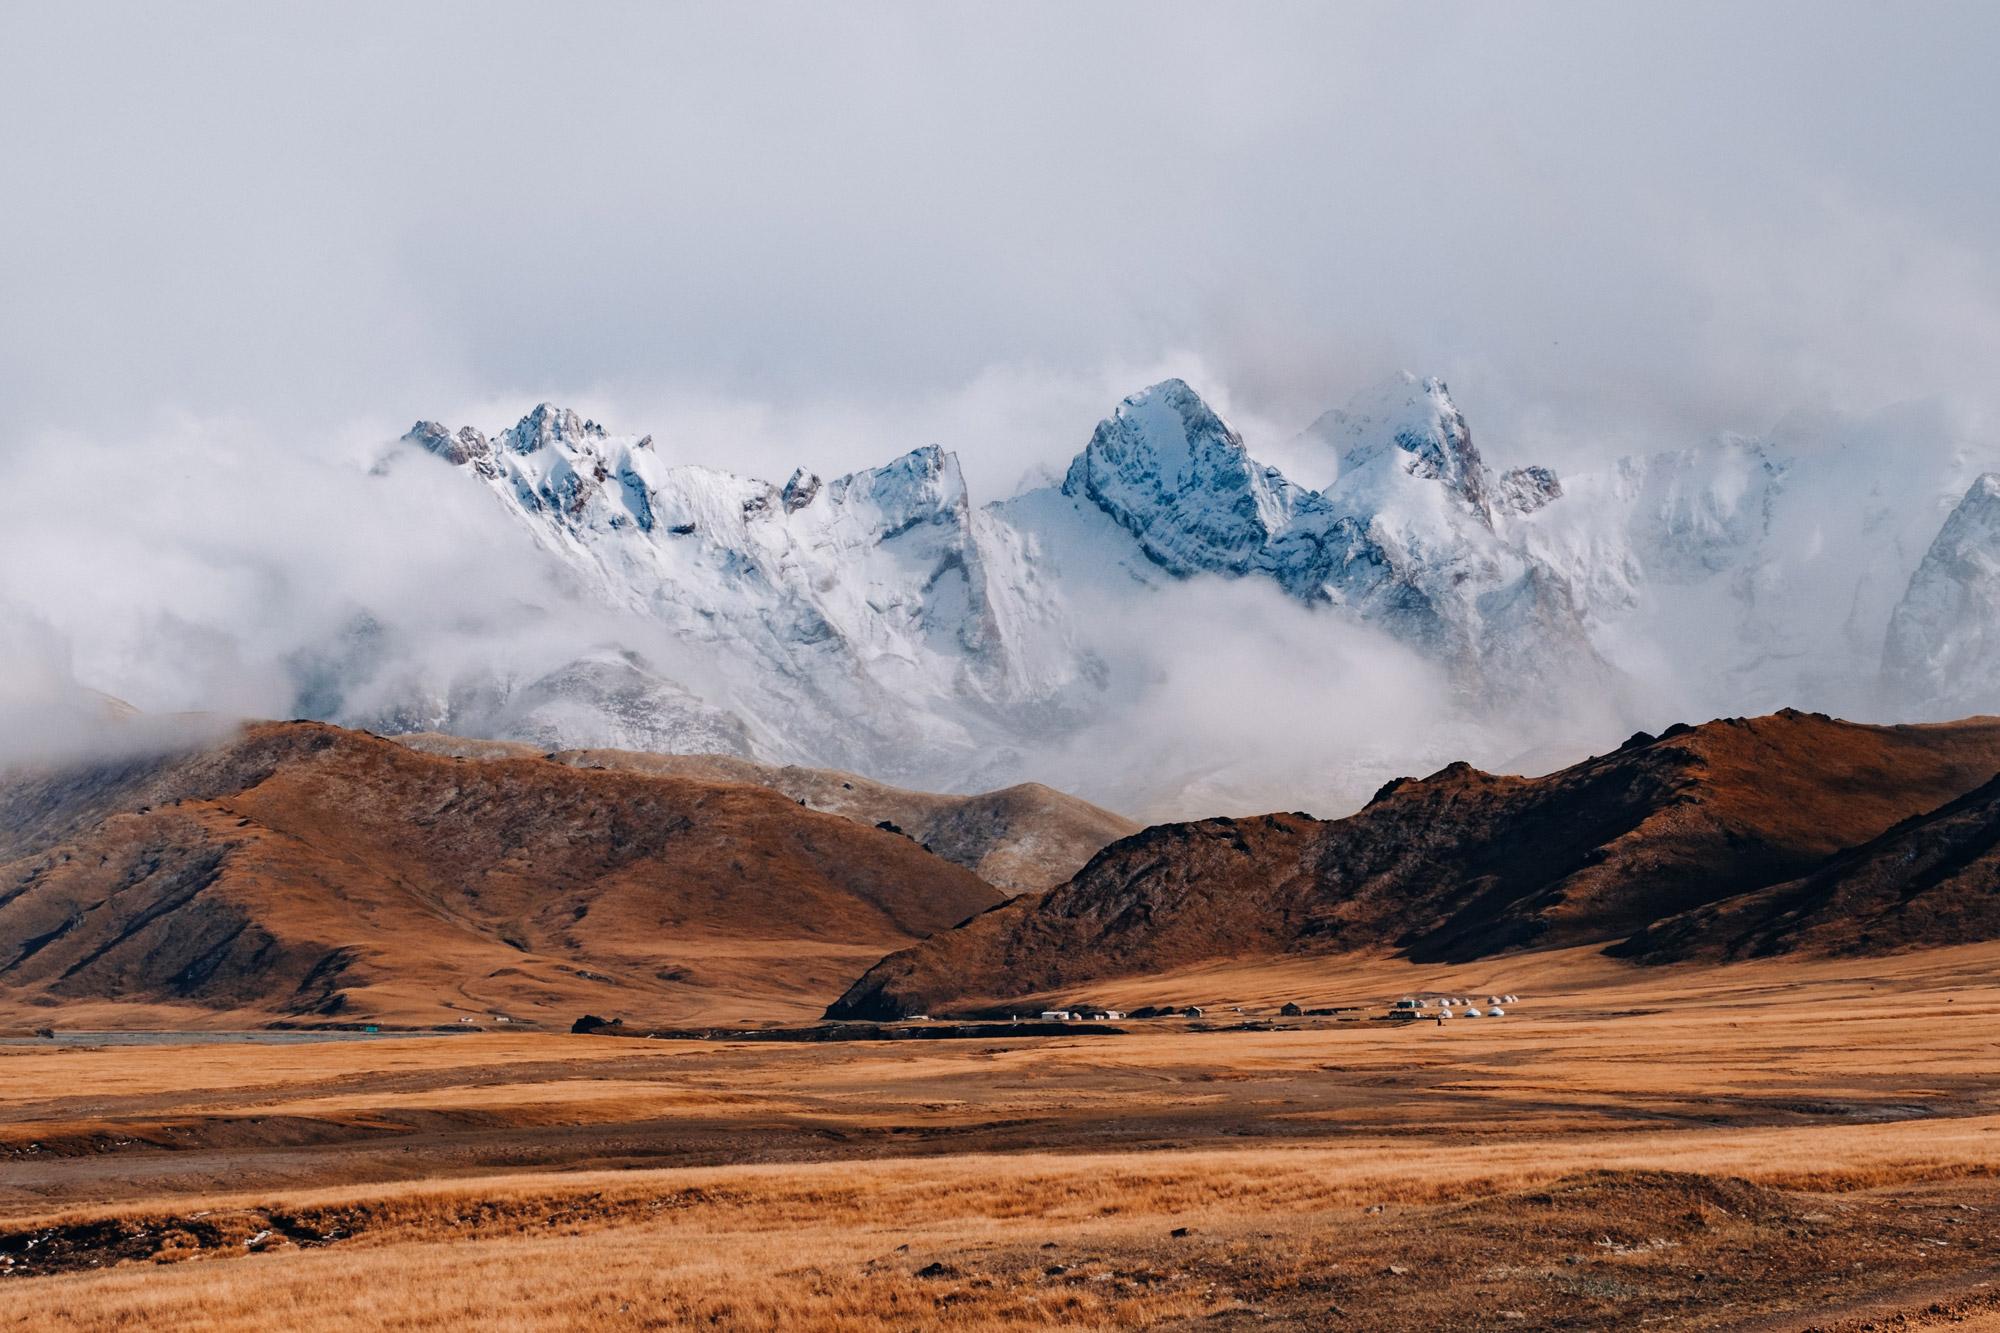 Binnenkort naar Kirgizië